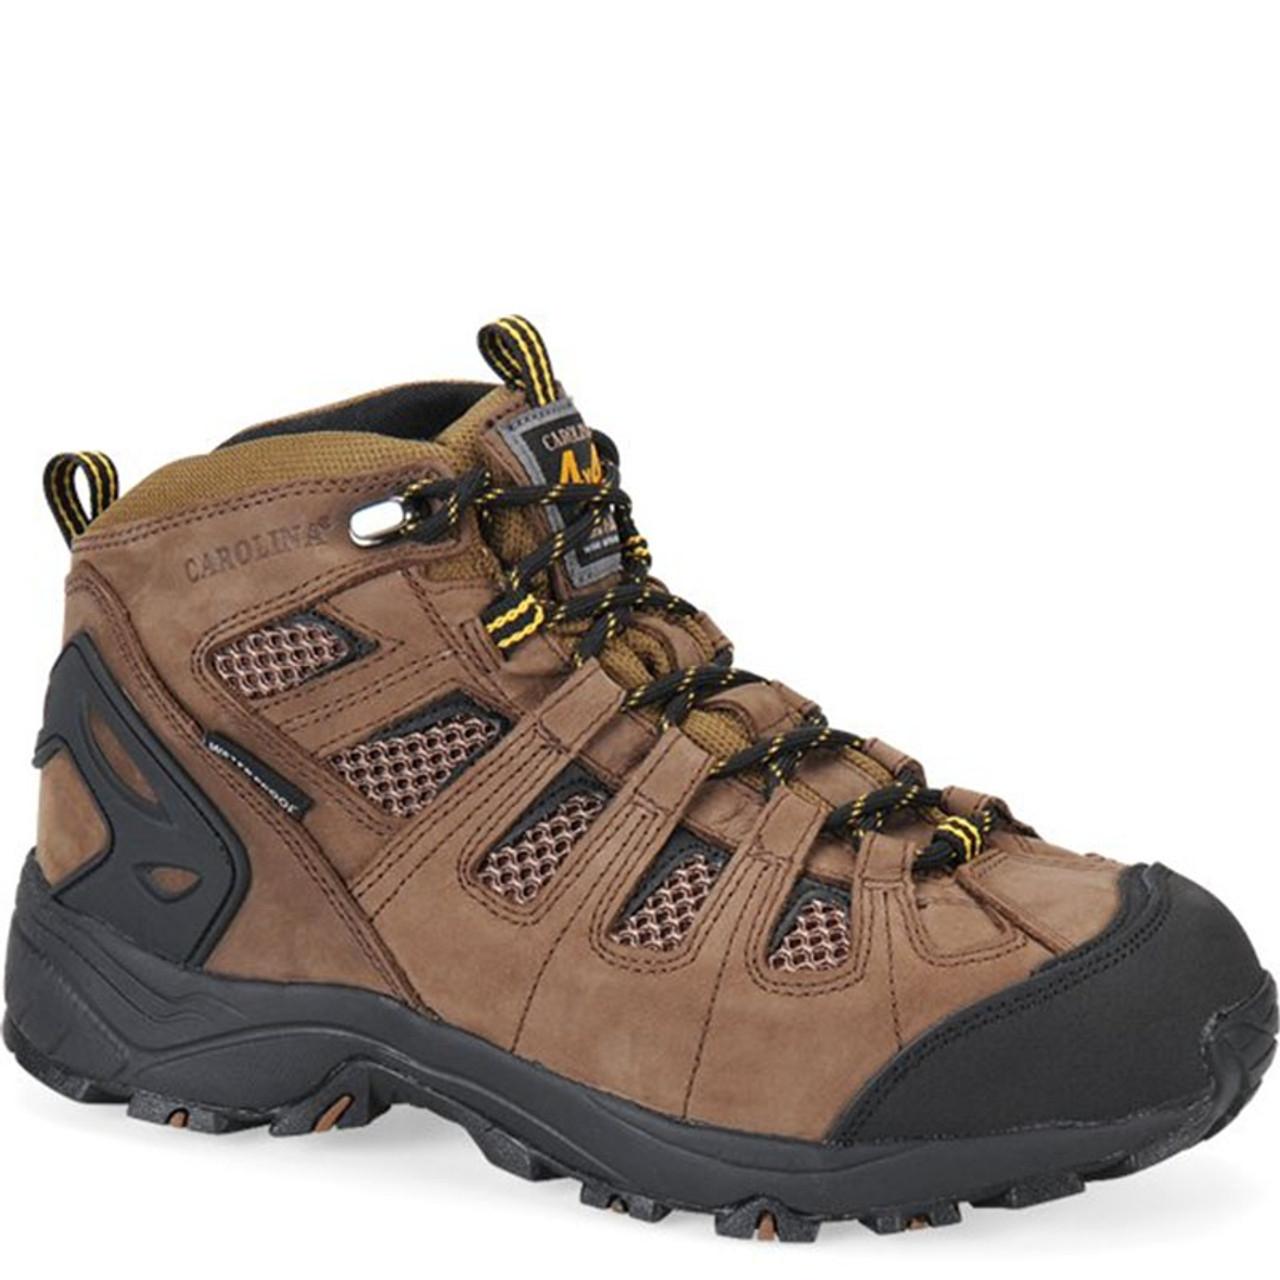 eb10565105c Carolina CA4525 QUAD CARBON 4x4 Composite Toe Non-Insulated Work Boots